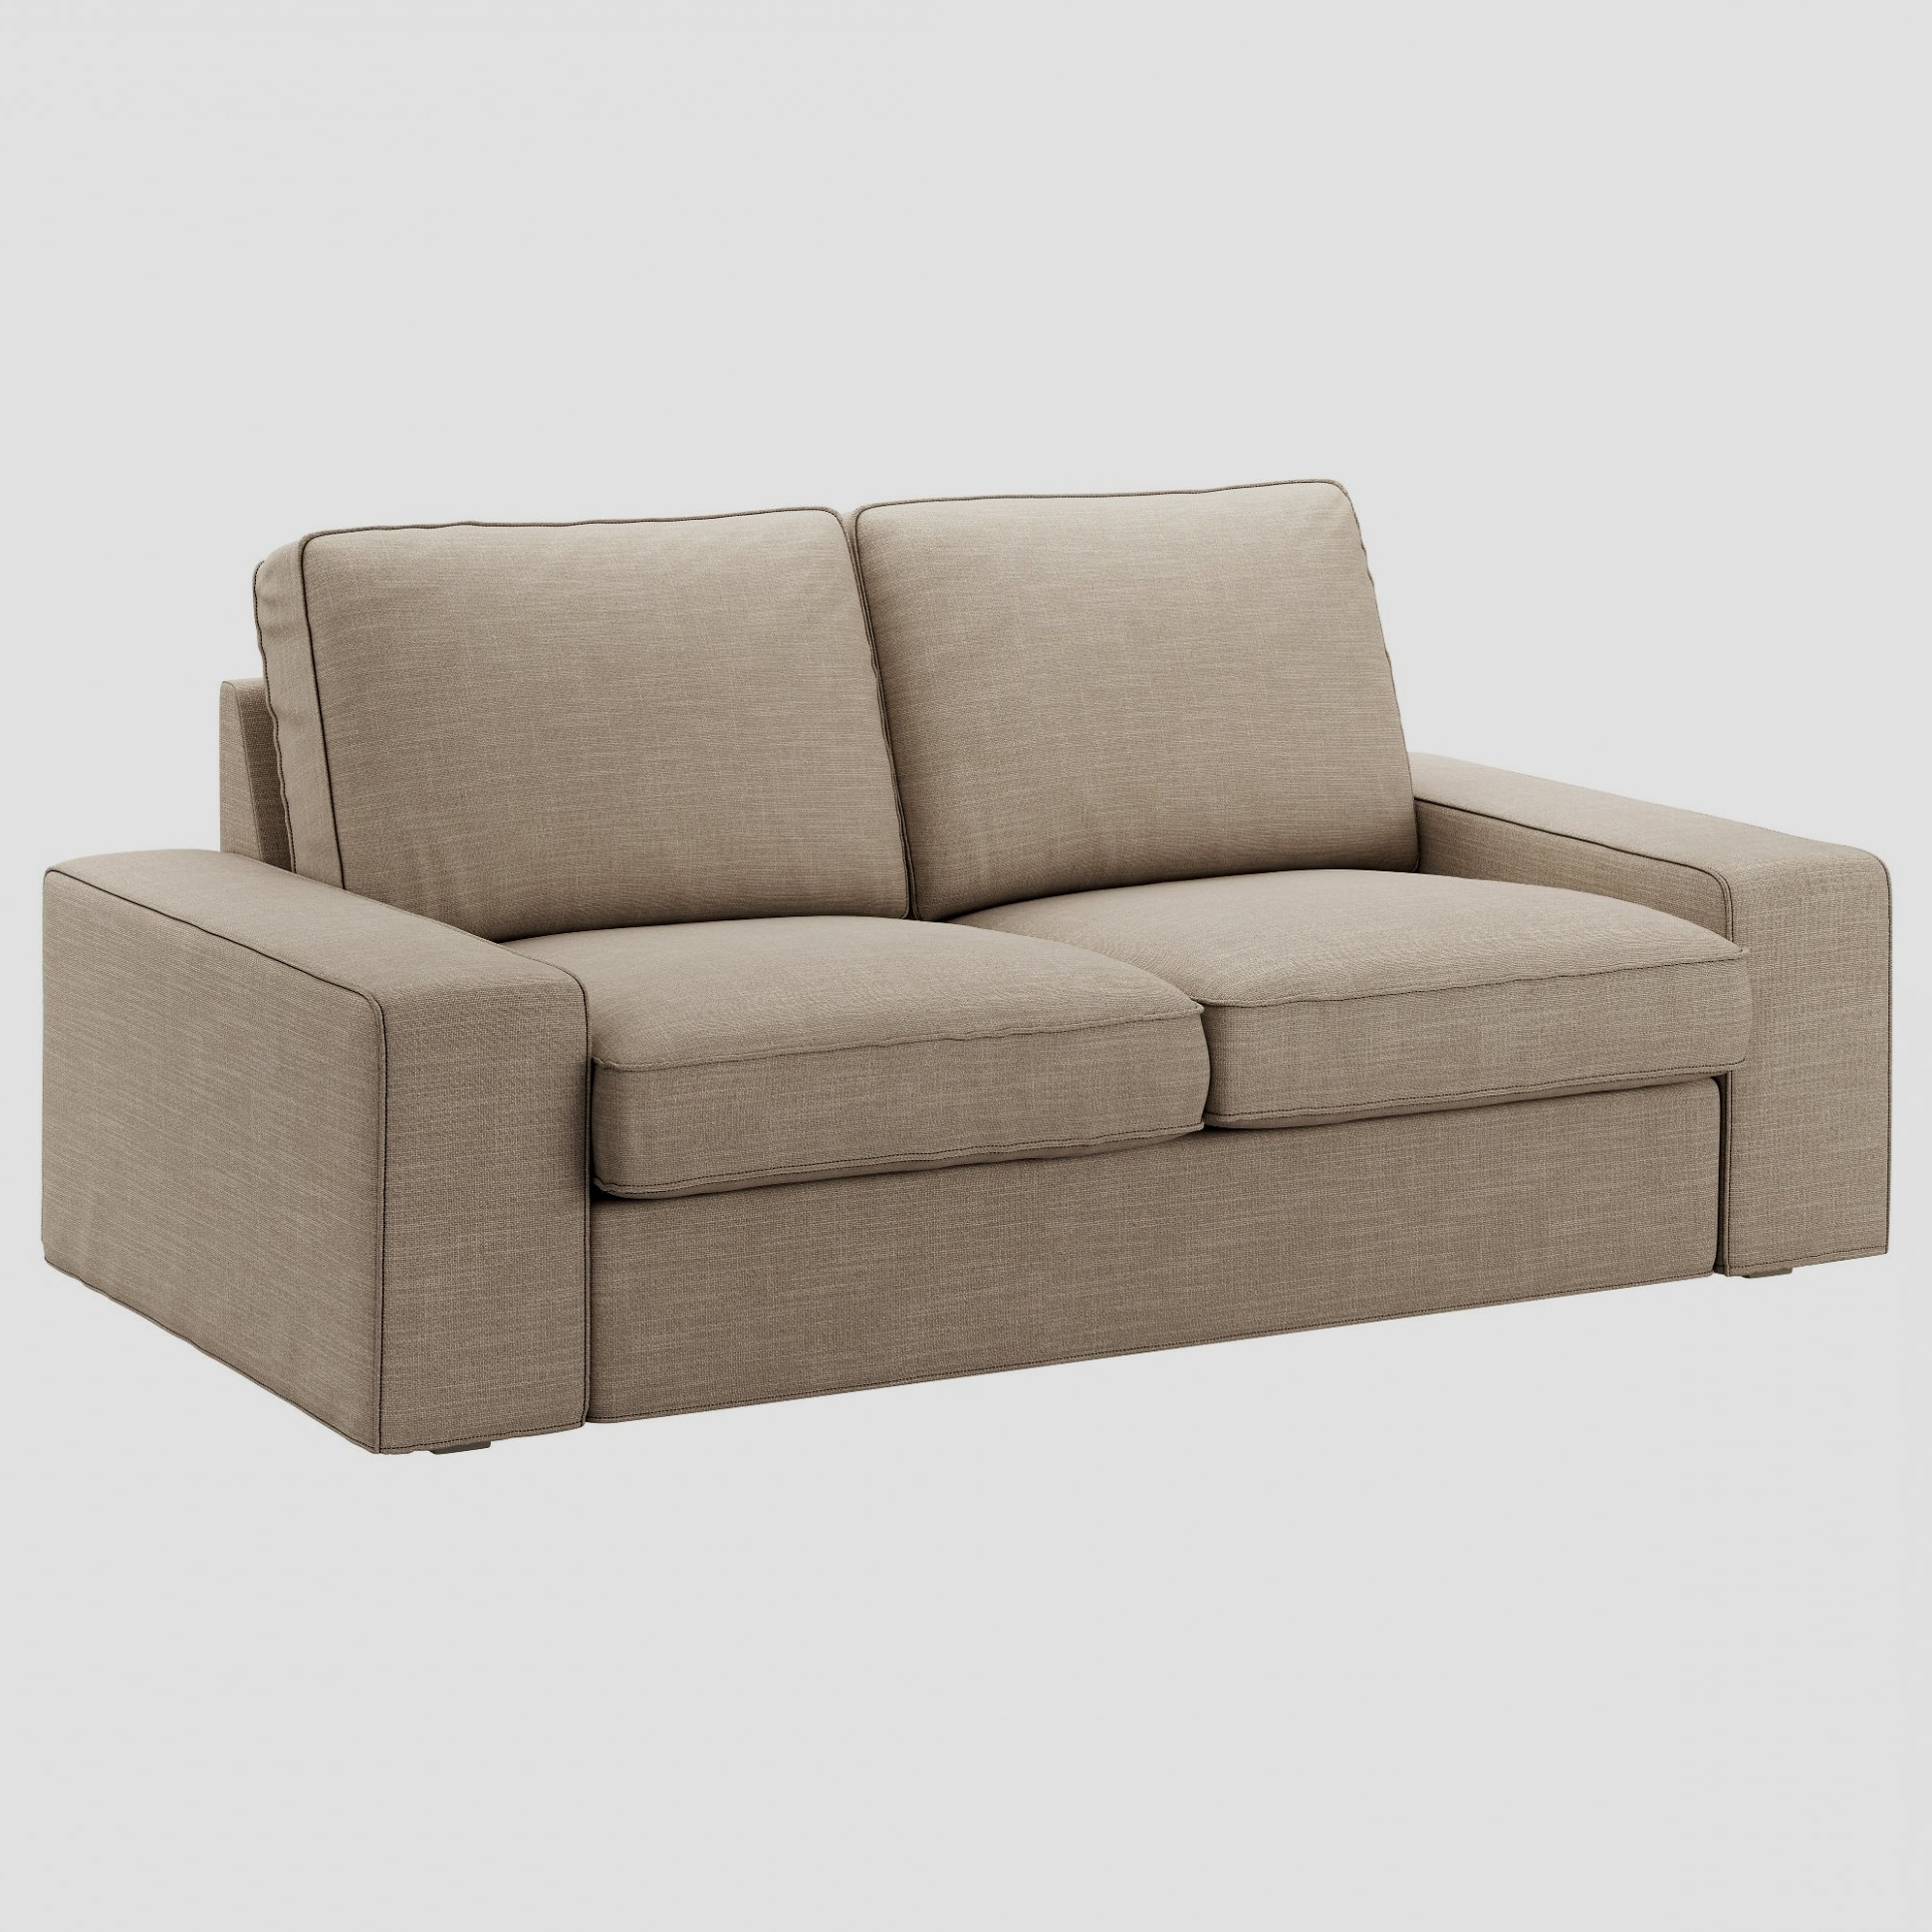 Reposabrazos sofa Etdg Reposabrazos sofa Lindo ColecciN De sofà S Kivik Busco Sillas